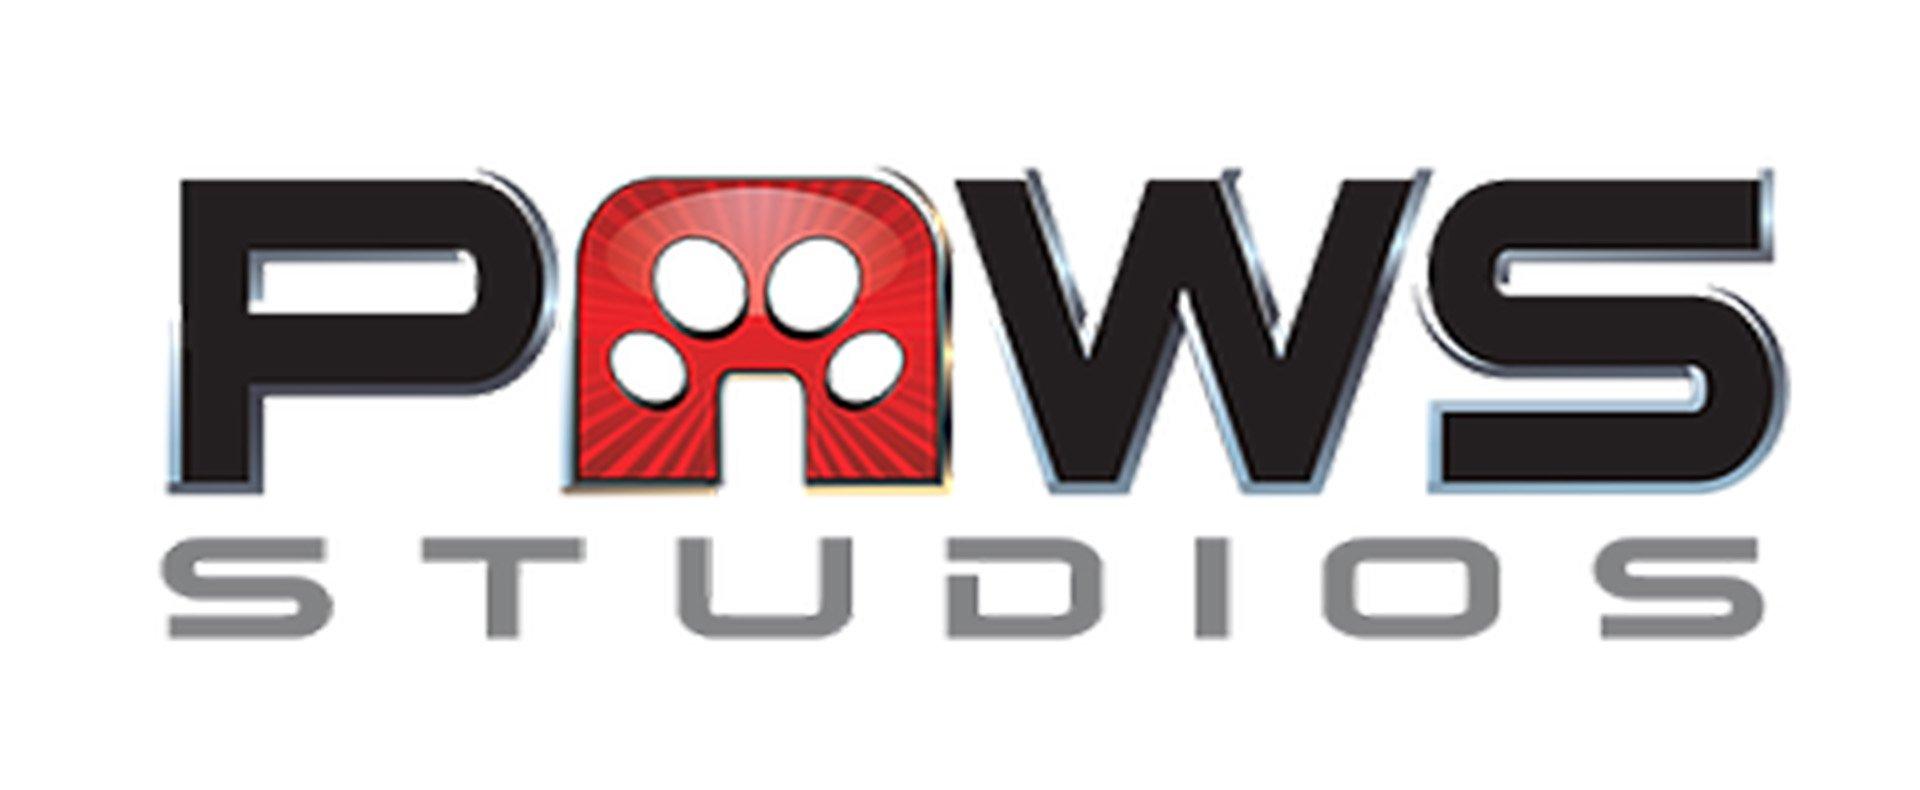 PAWS Studios